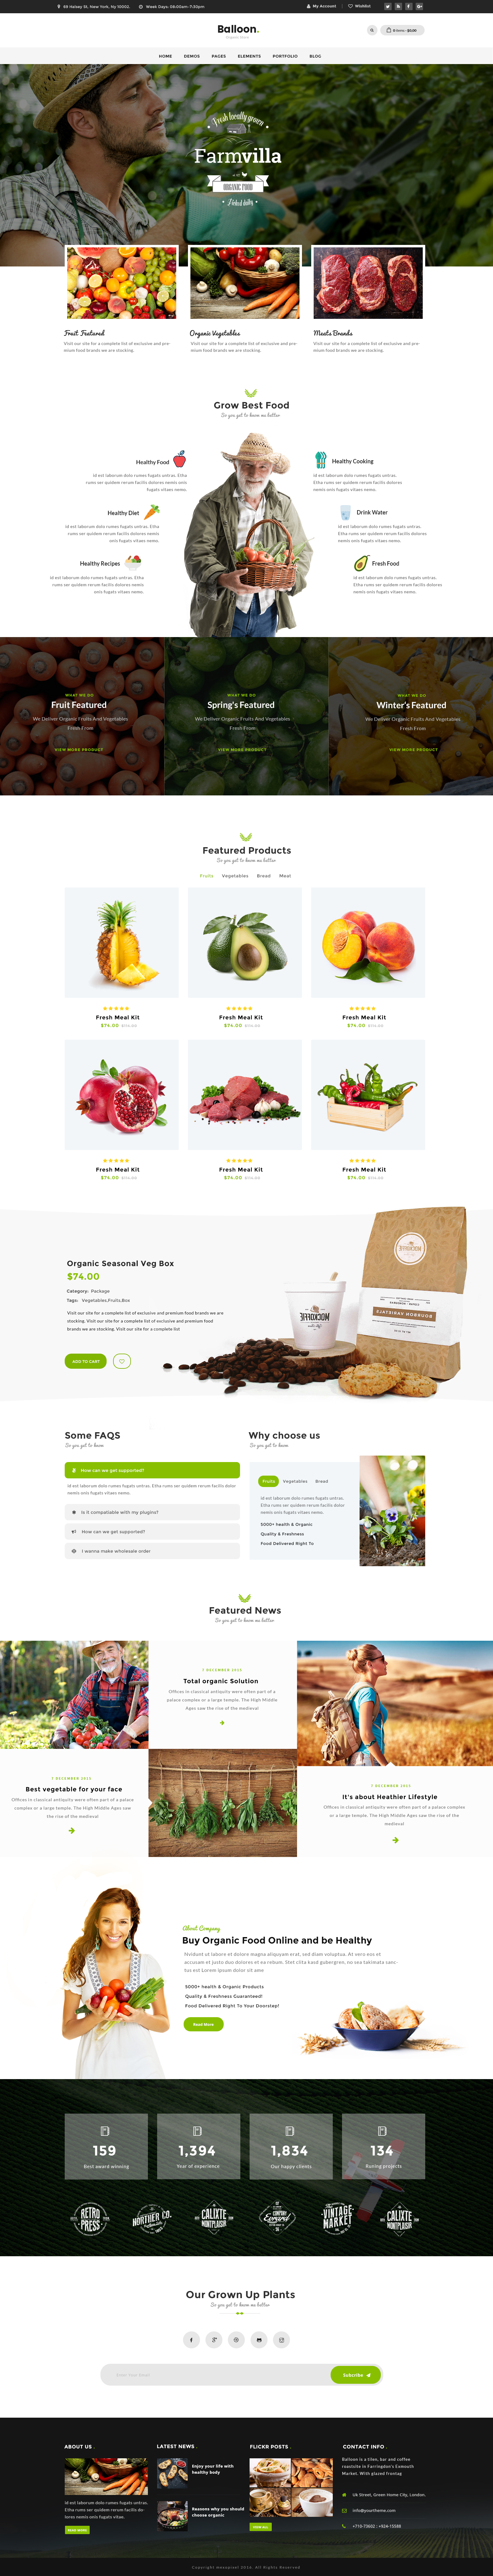 Balloon | Organic Farm & Food Business PSD Template by mexopixel ...